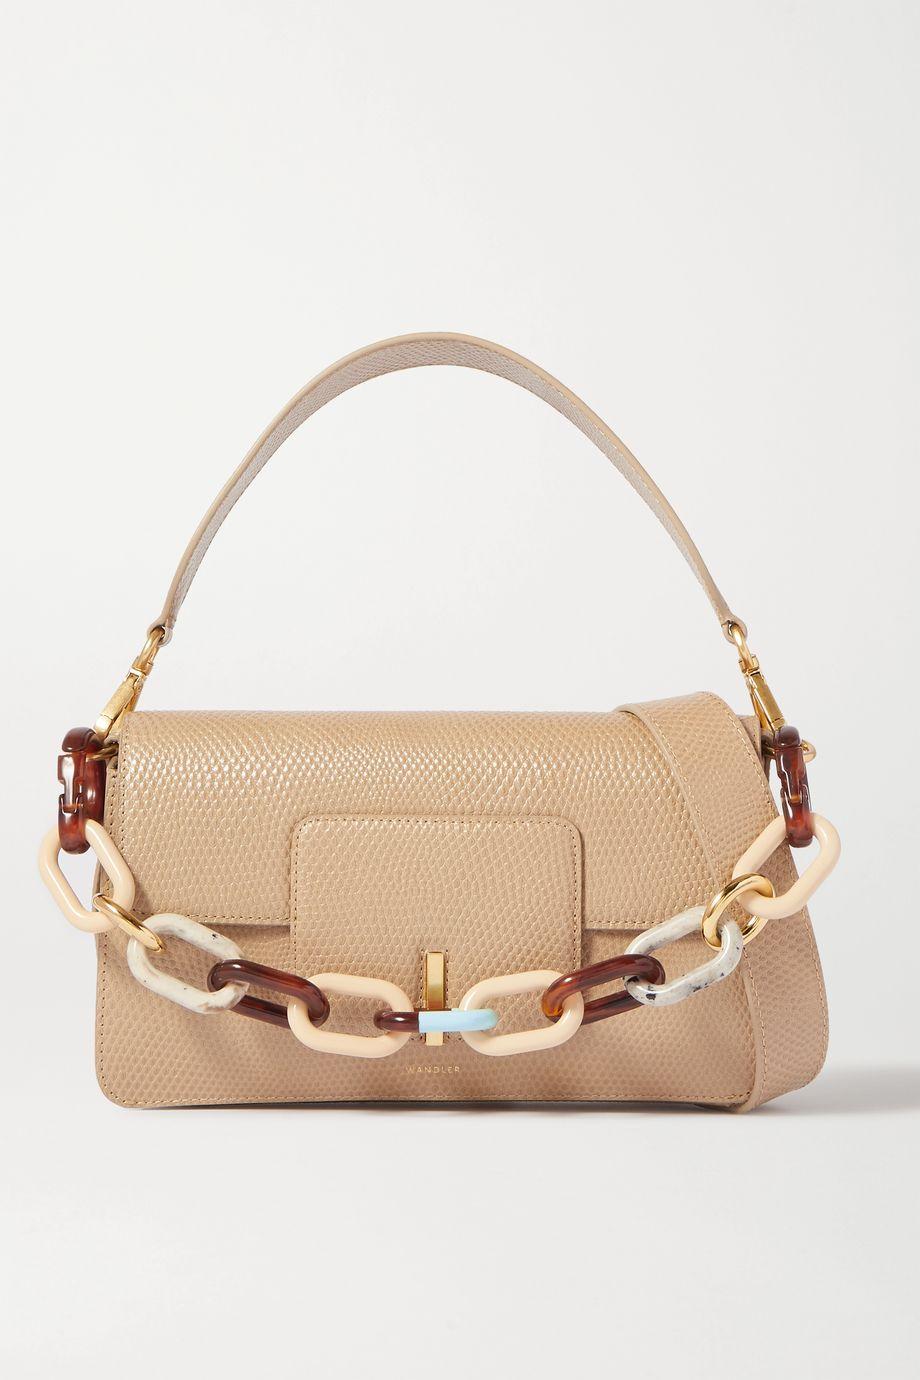 Wandler Georgia chain-embellished lizard-effect leather shoulder bag